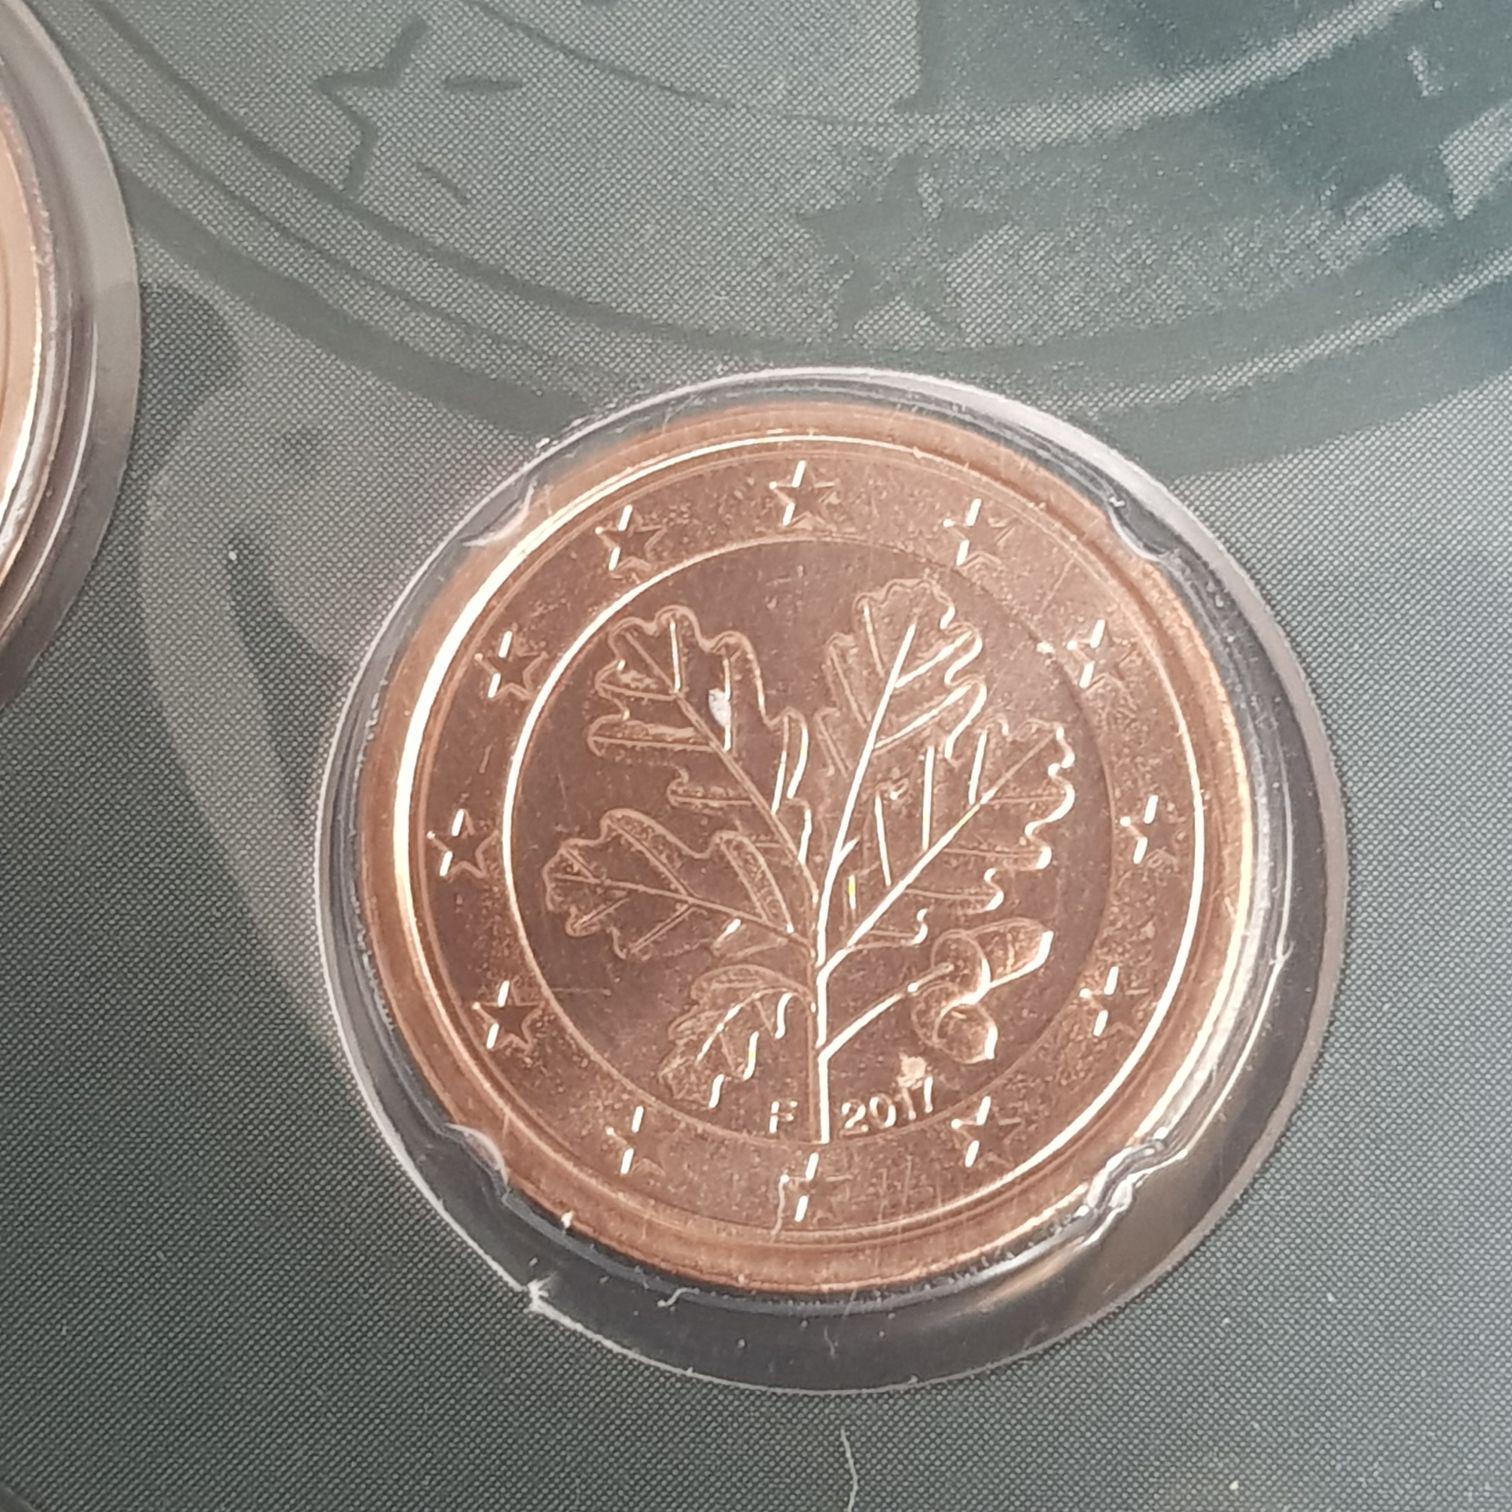 .01 Centavo De Euro Coin - $.01 (2017) back image (back cover, second image)